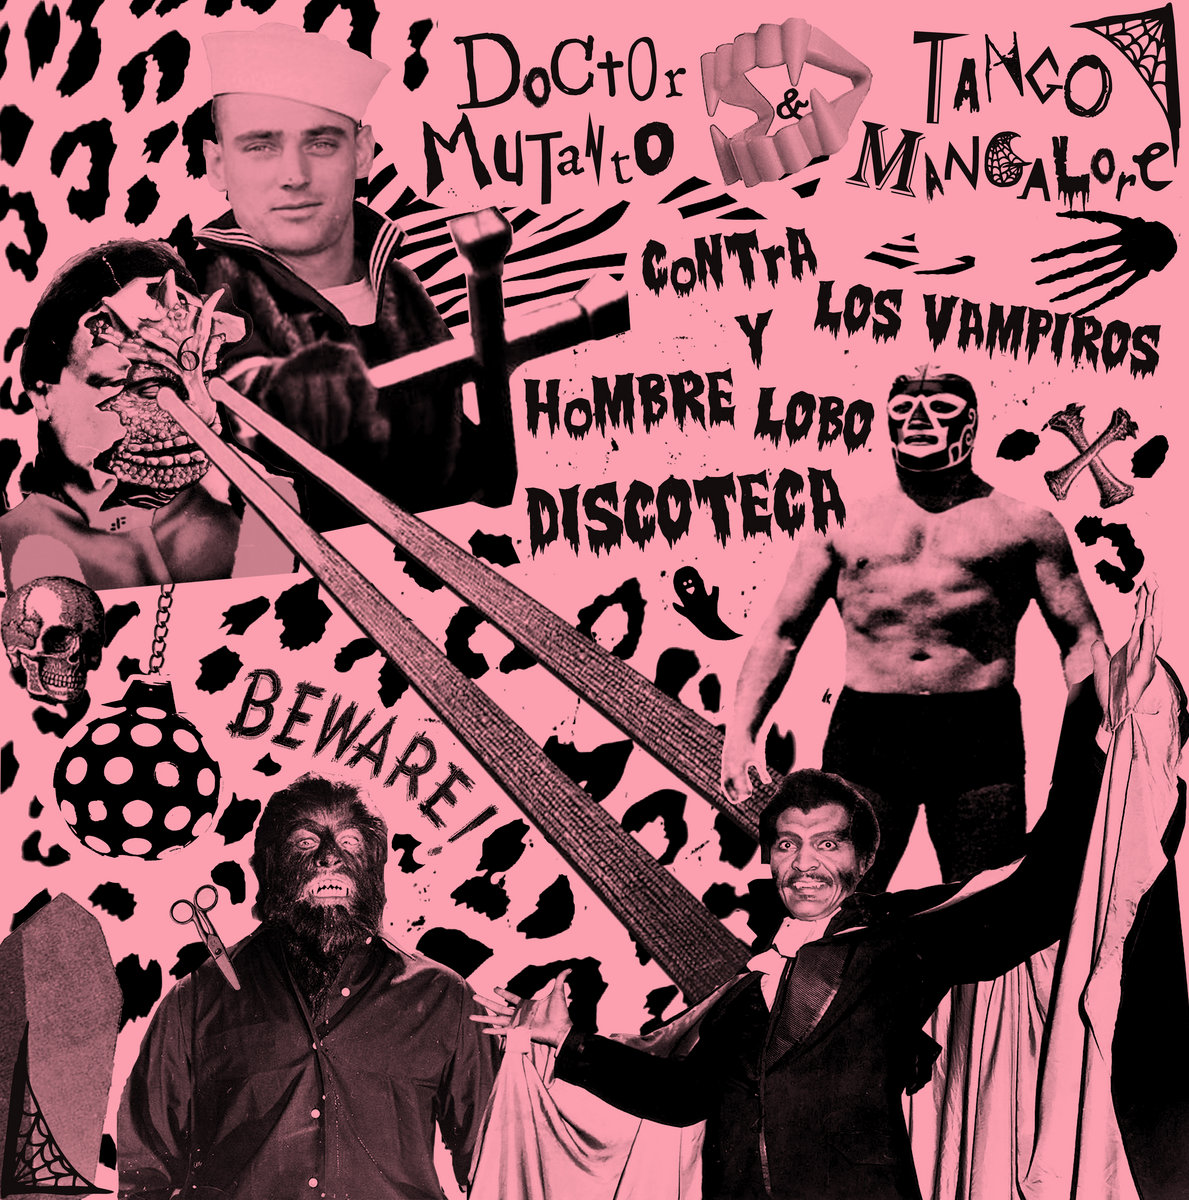 Tango Mangalore - Comandante Macabro (LP Album)   Tango